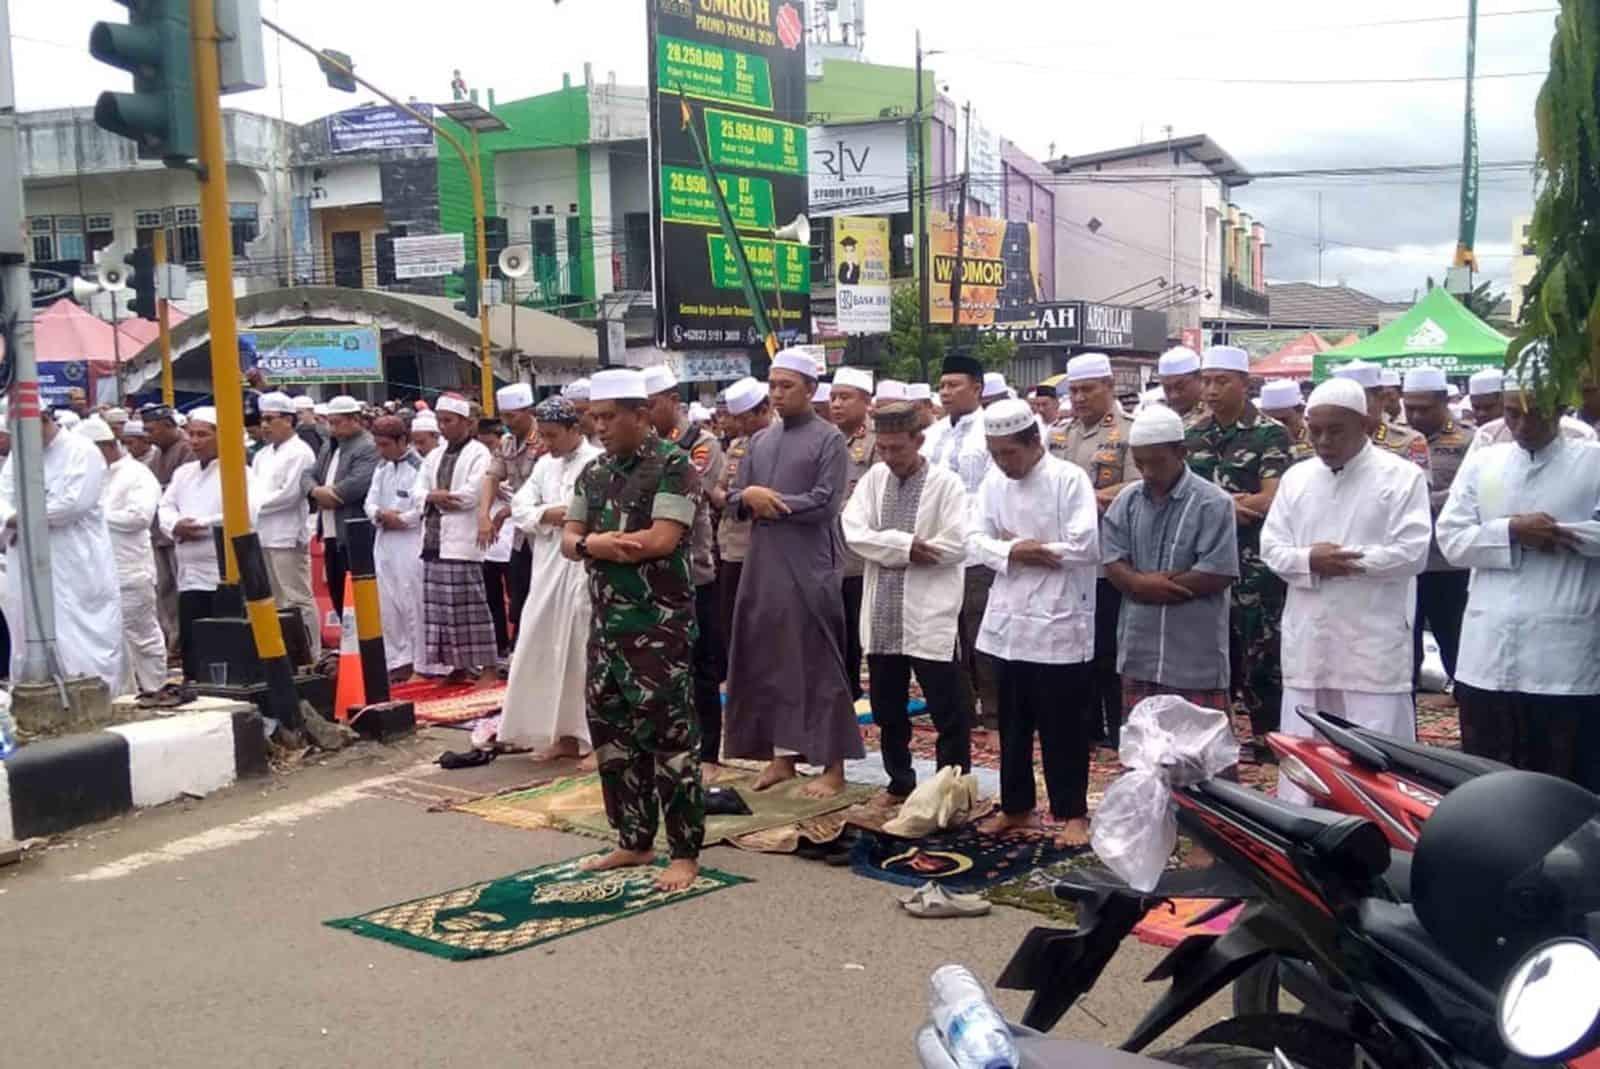 Komandan Lanud Sjamsudin Noor Beserta Forkopimda Kalimantan Selatan Pantau Kegiatan Haul Guru Sekumpul